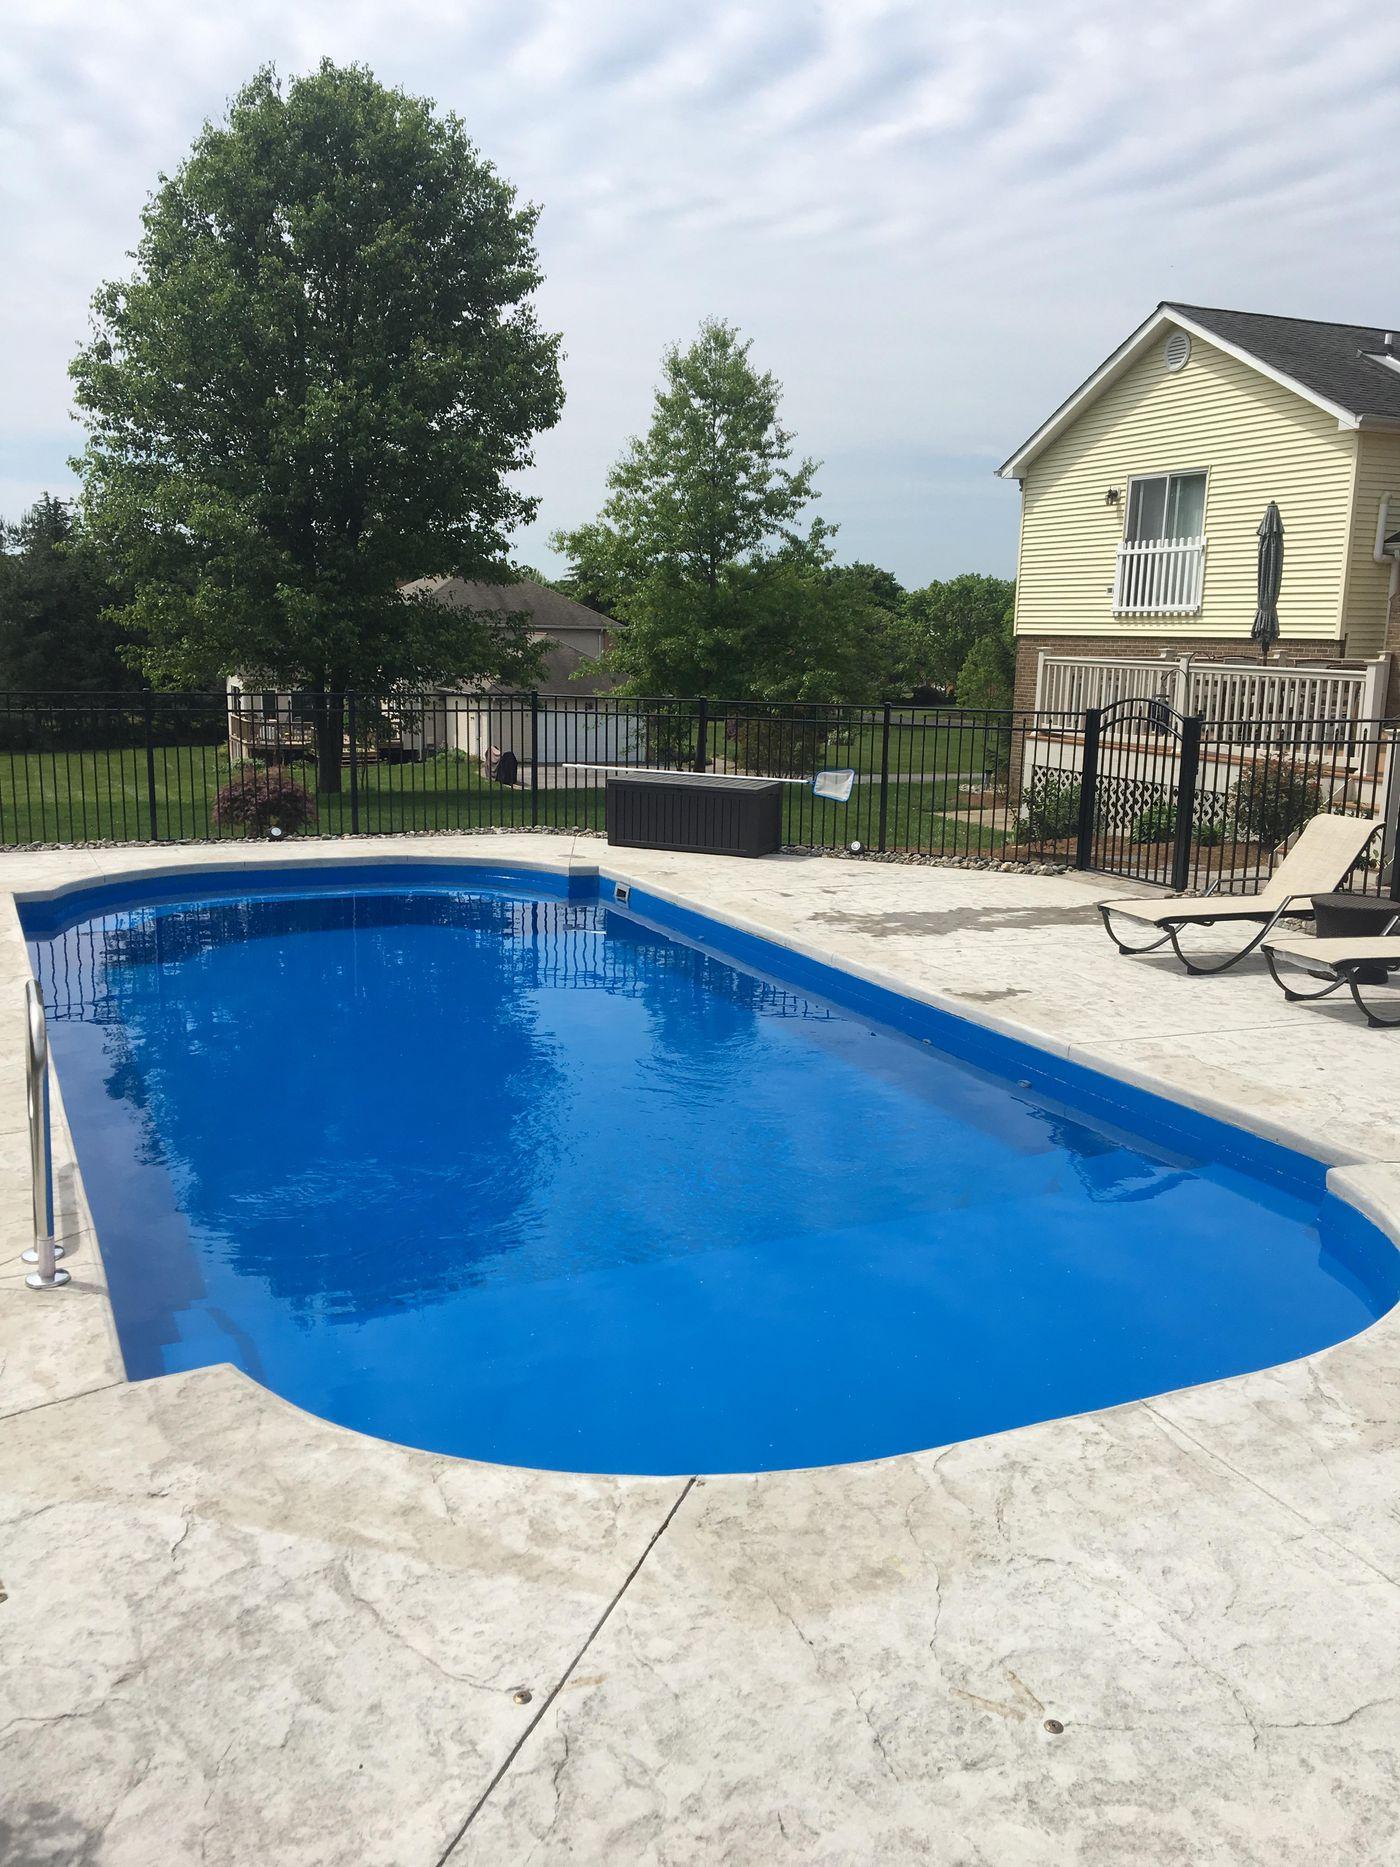 Roman Lounger inground fiberglass pool with tanning ledge